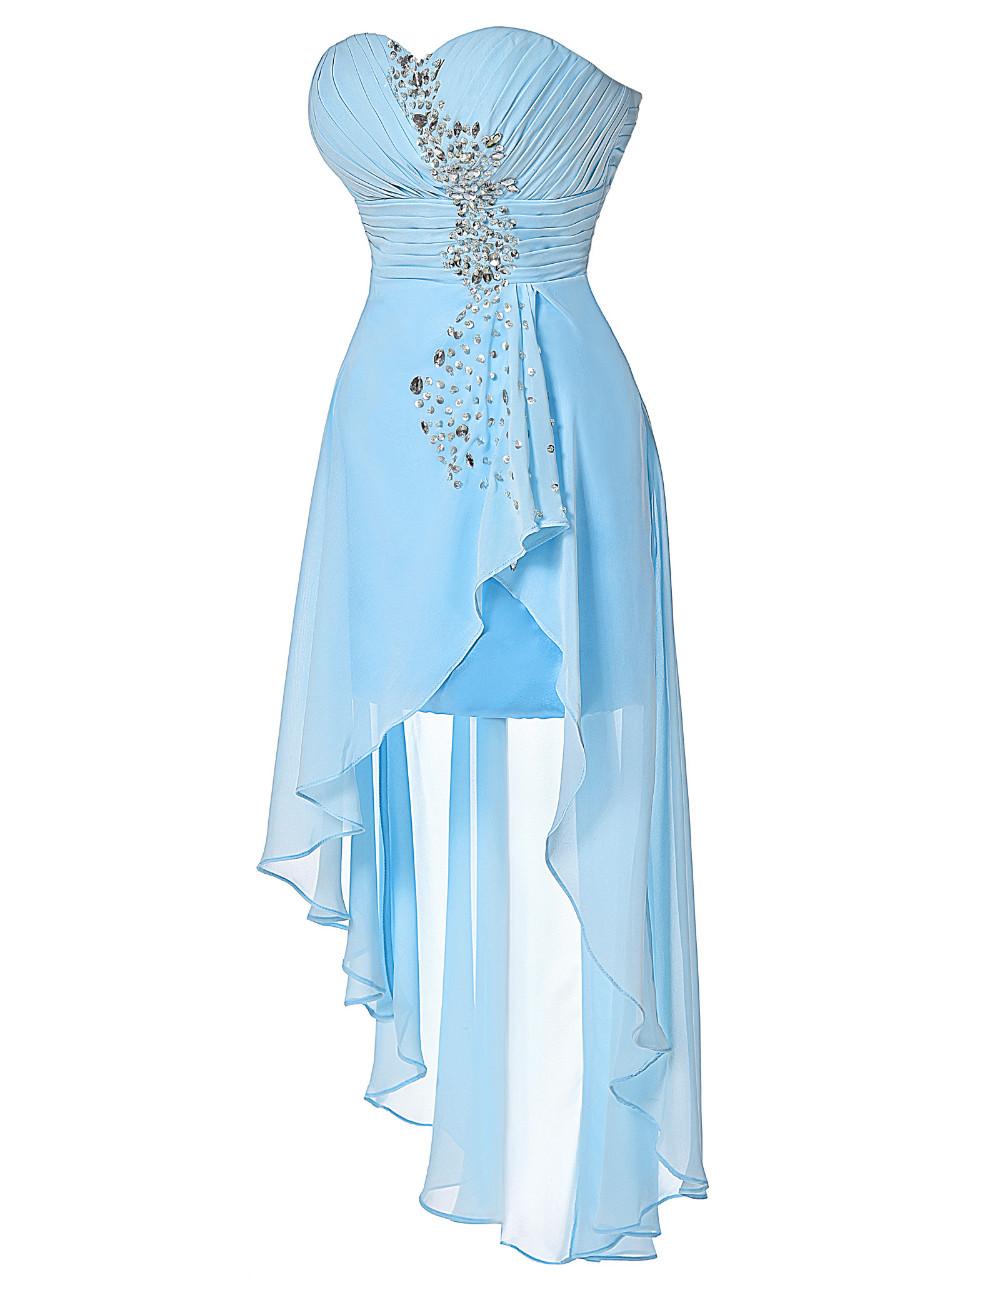 HTB1xmD9KVXXXXbhXpXXq6xXFXXXSHigh Low Short Front Long Back Strapless Dress